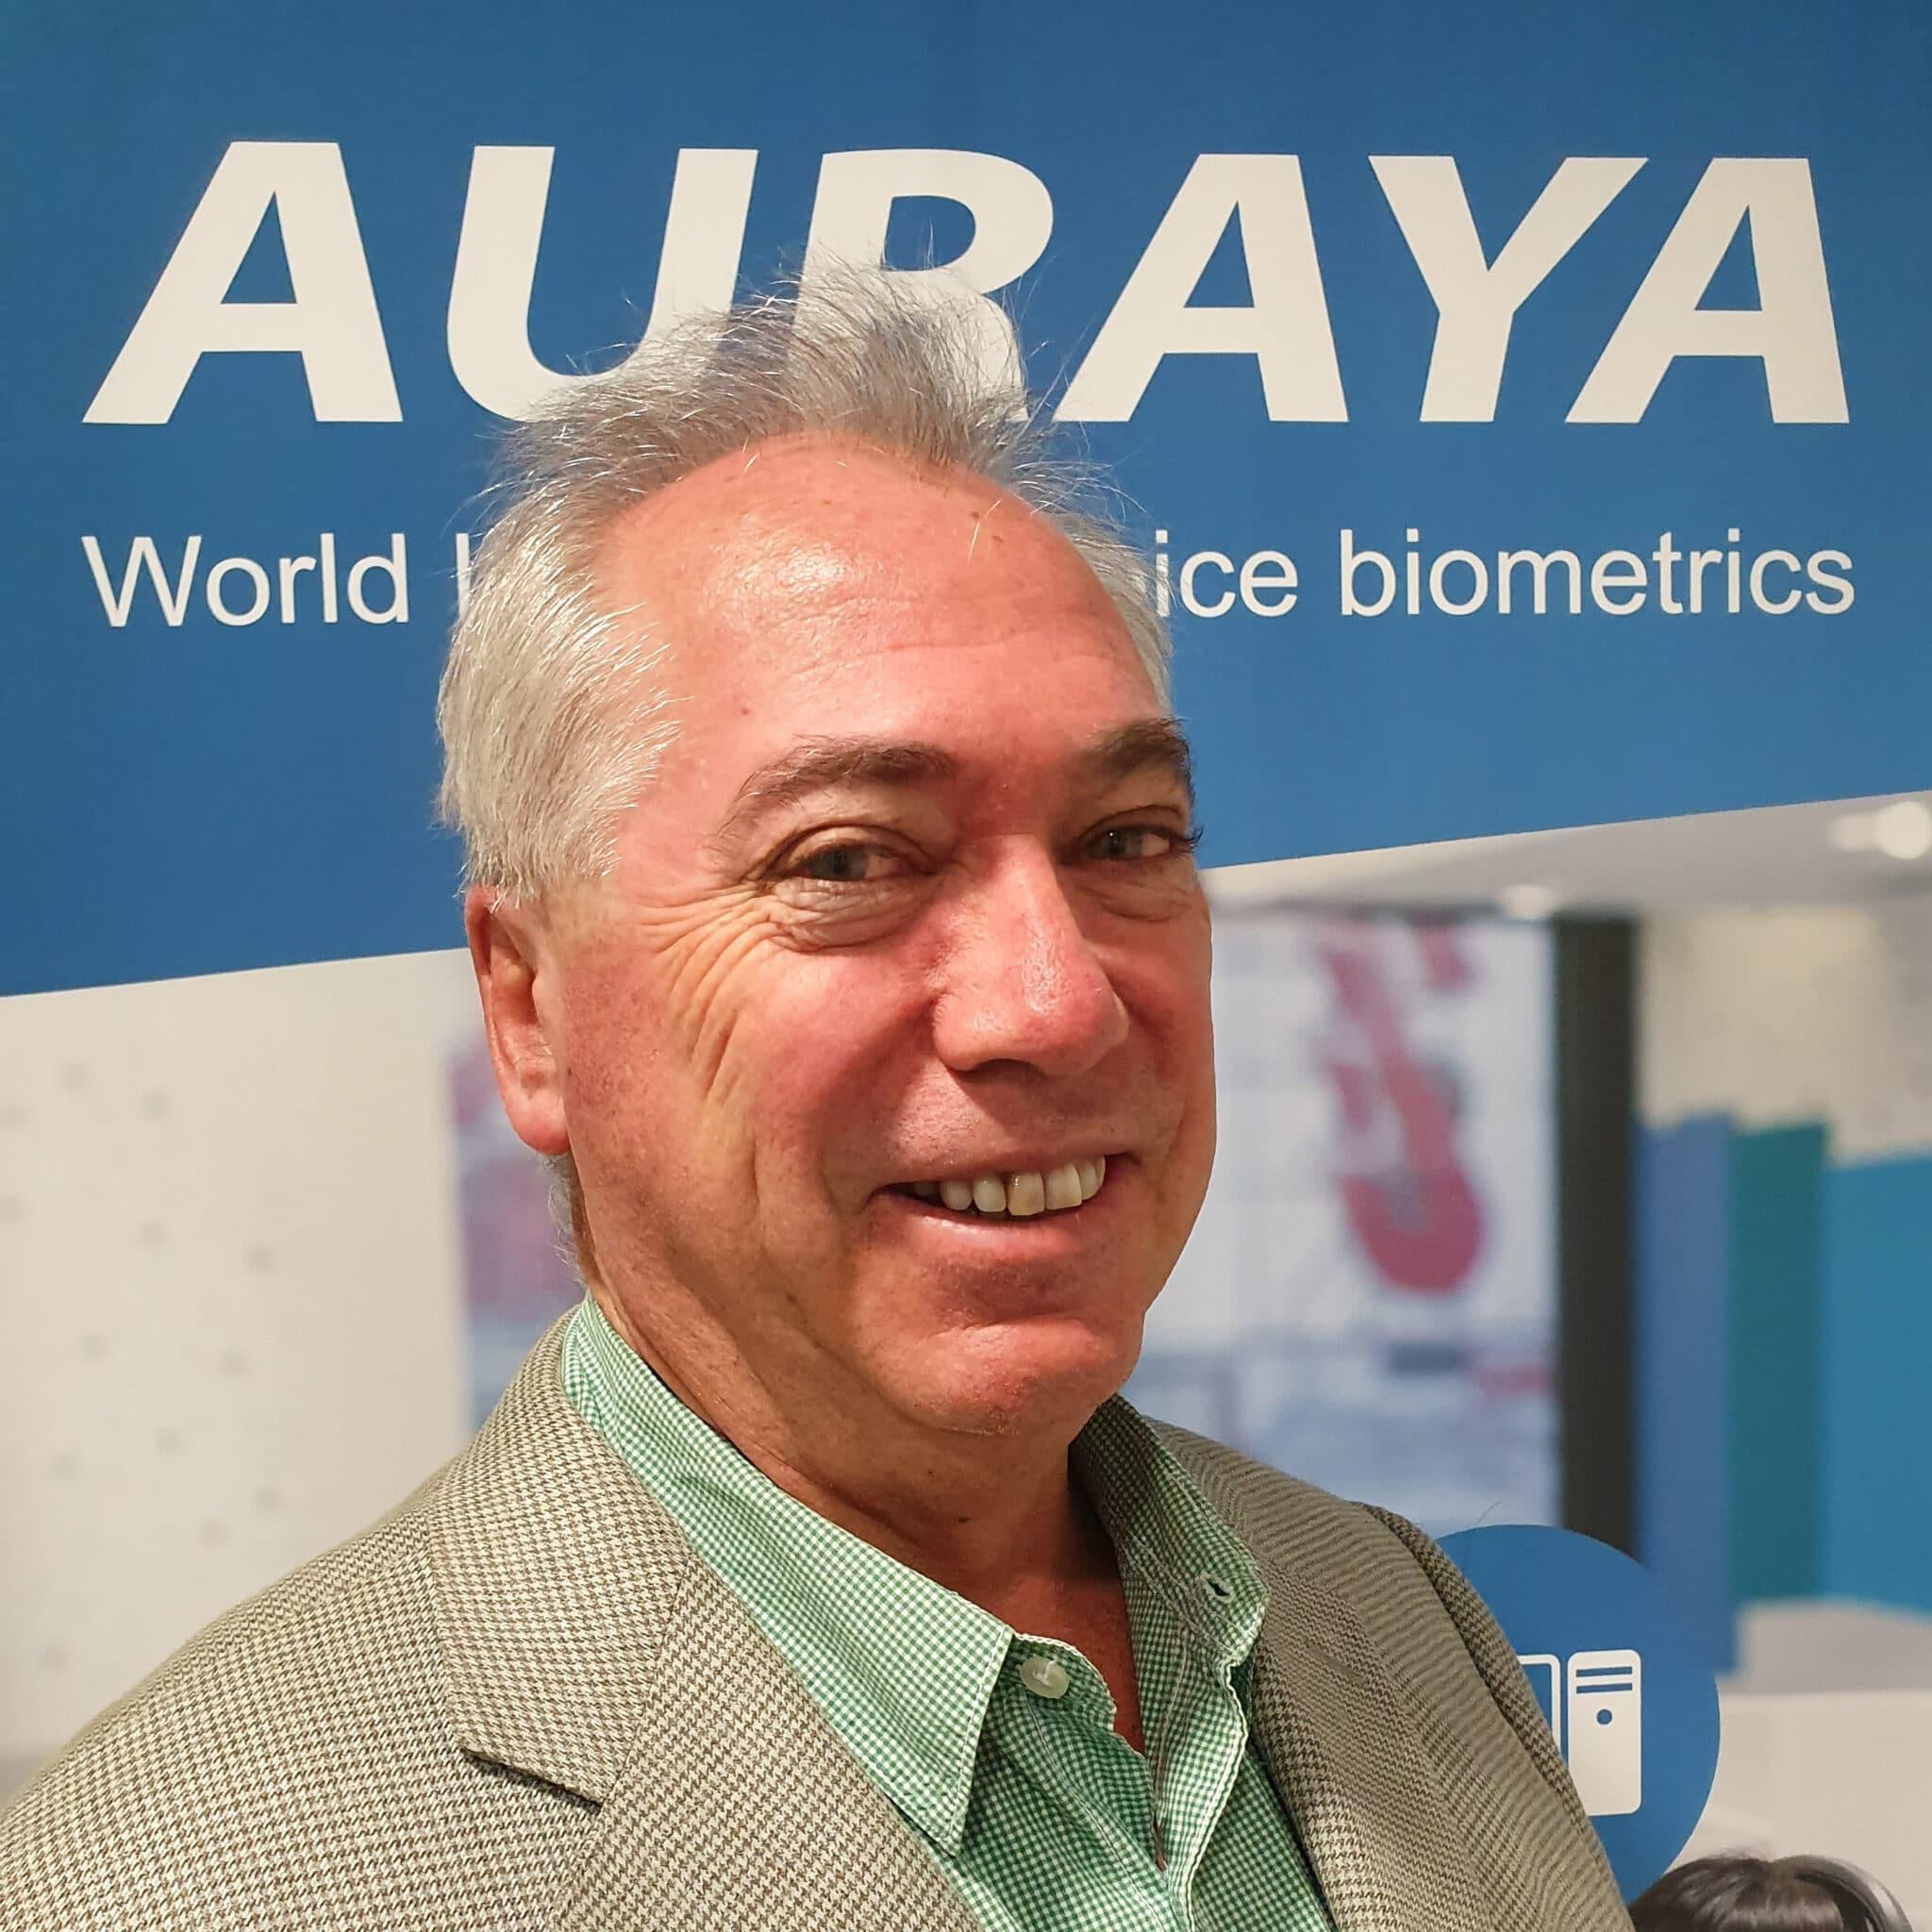 Paul Magee Auraya